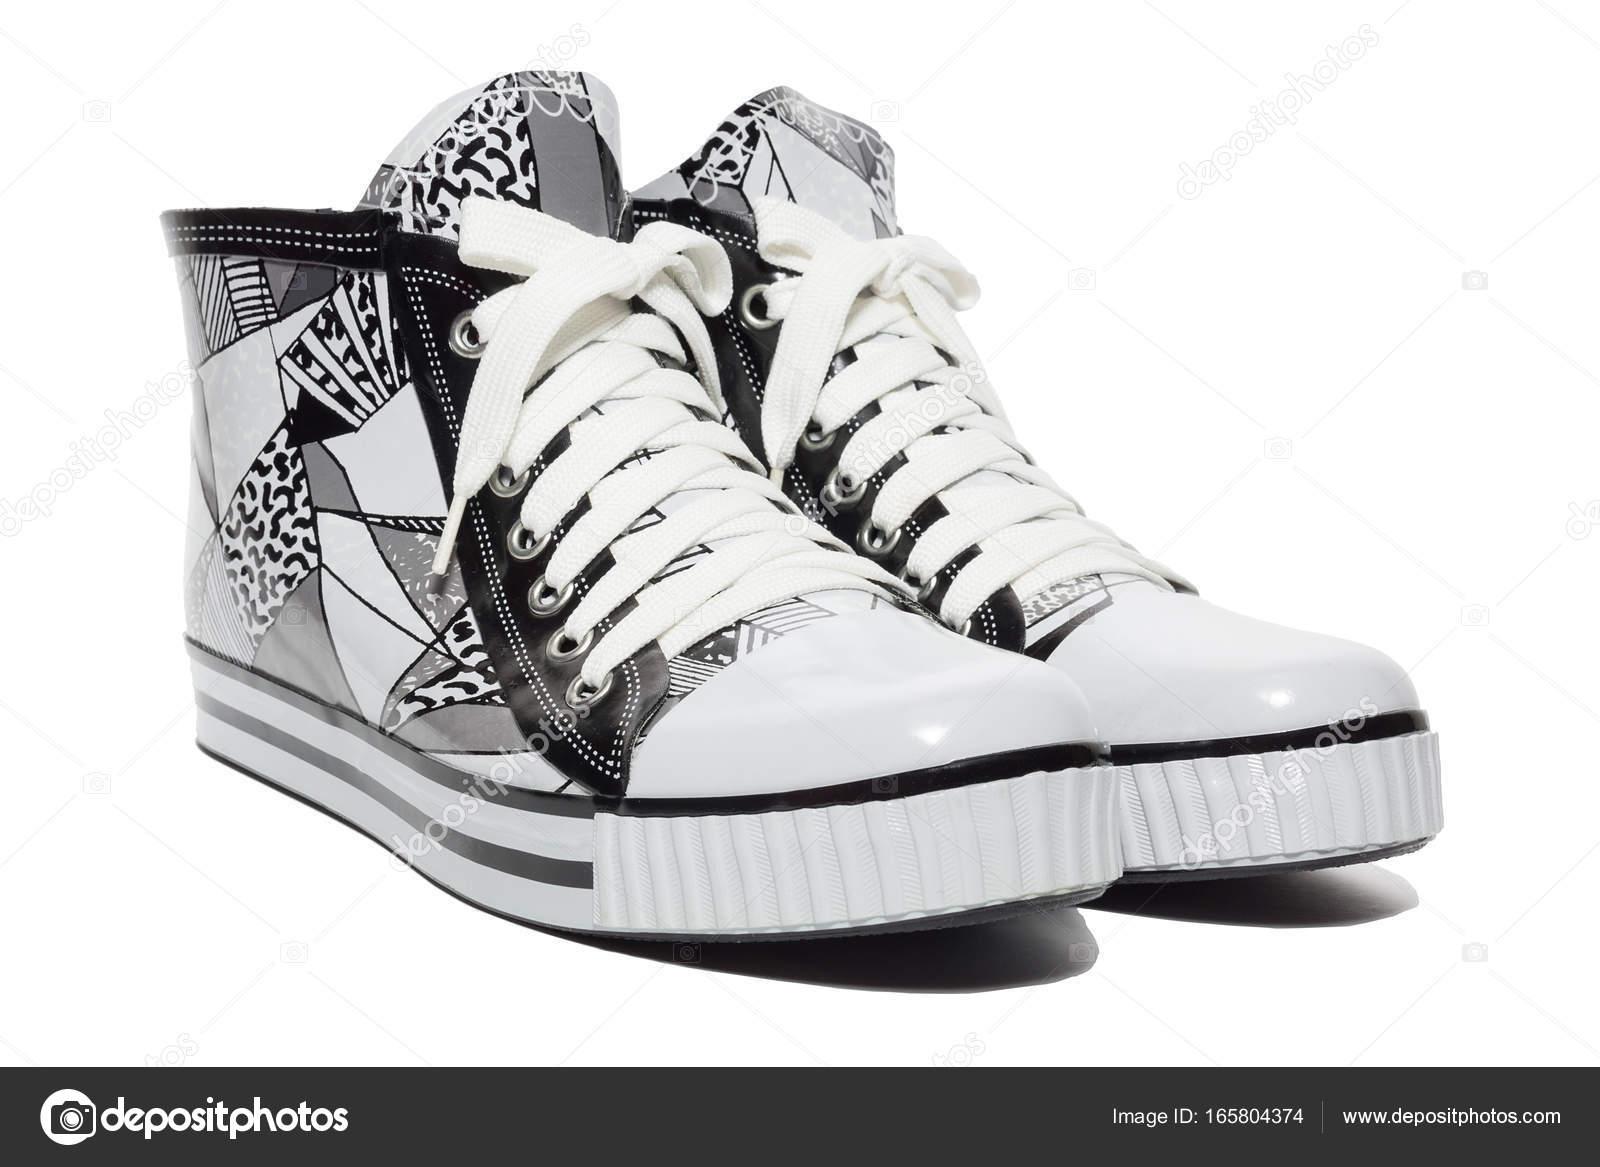 e68140d3673 Ελαστικά γυναικεία παπούτσια της κορδόνια, απομονωμένες, στούντιο — Εικόνα  από ...